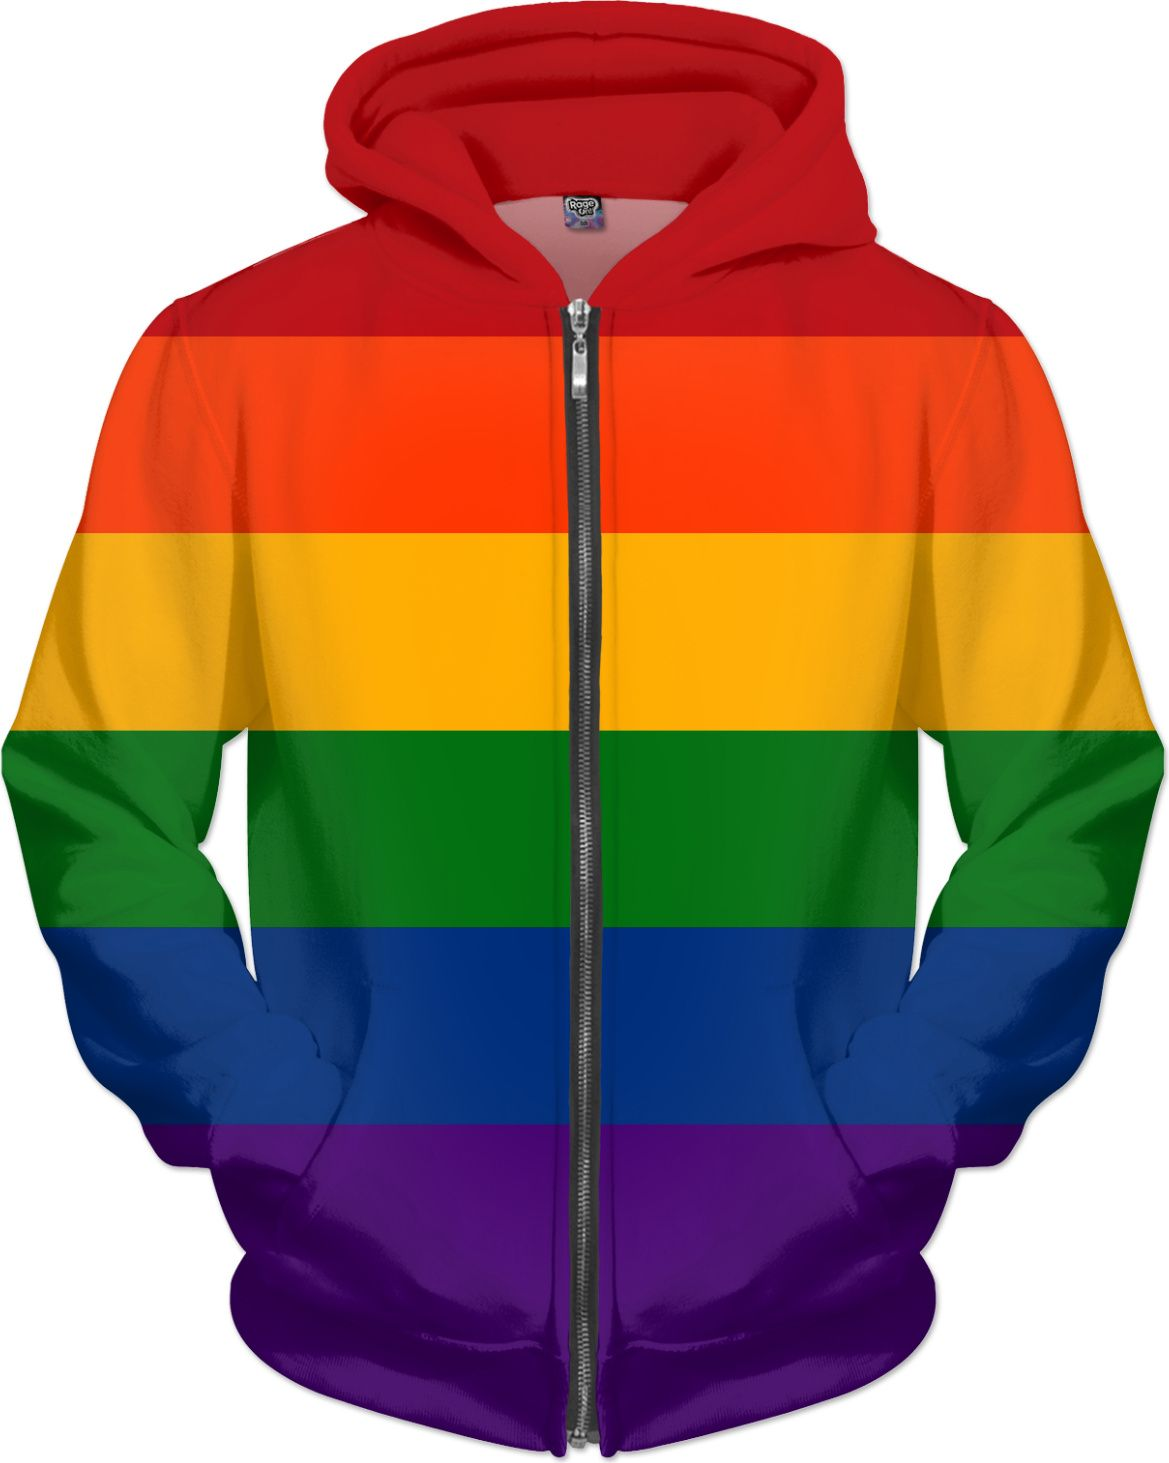 ADIDAS ORIGINAL SUPERSTAR #LGBT PRIDE COLLECTION on The Hunt